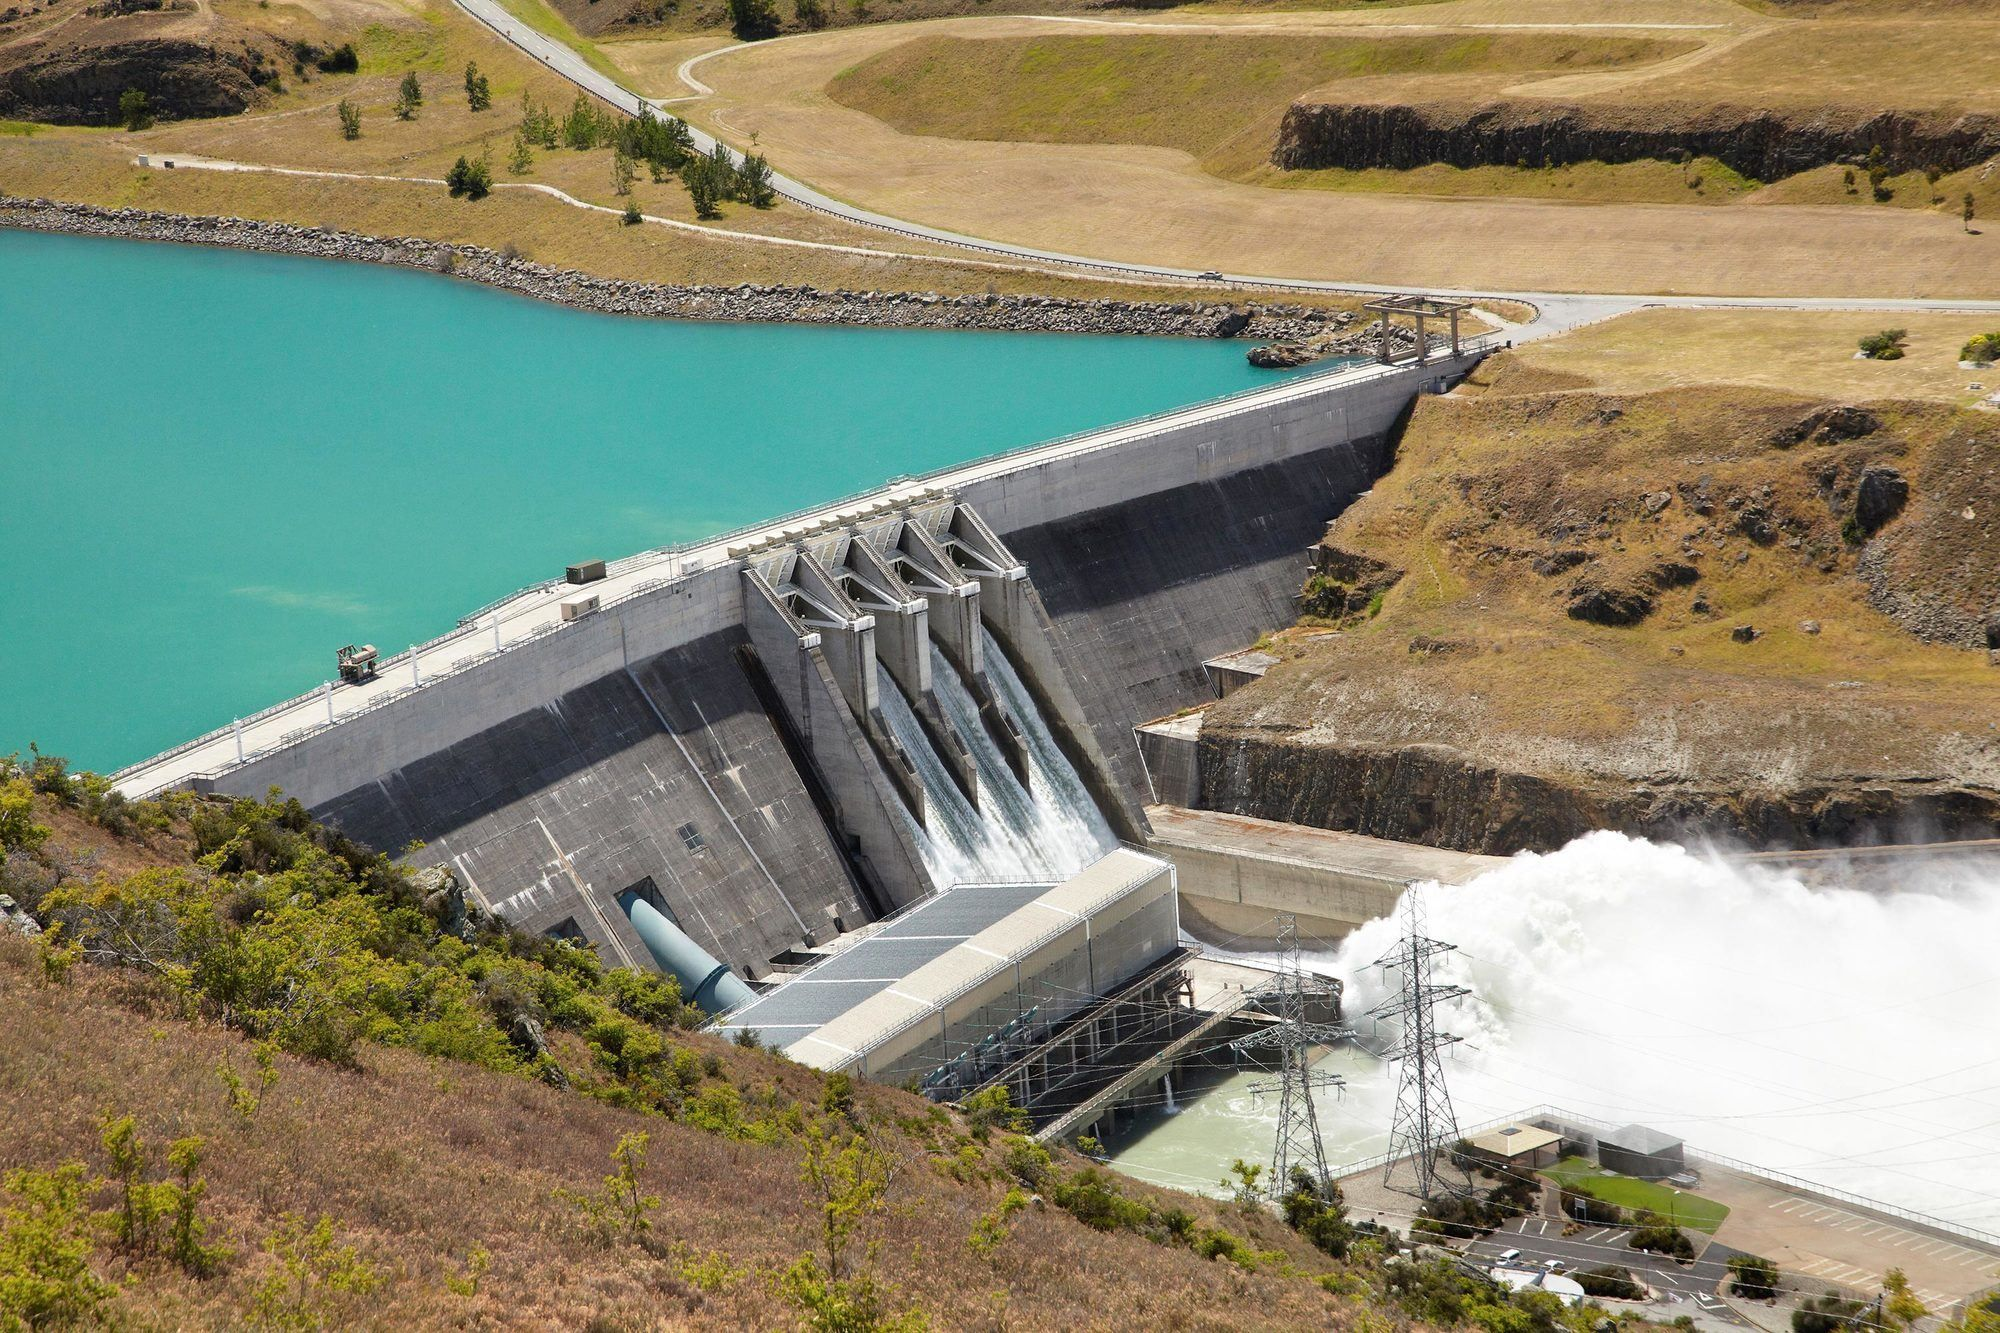 Le barrage de Clyde